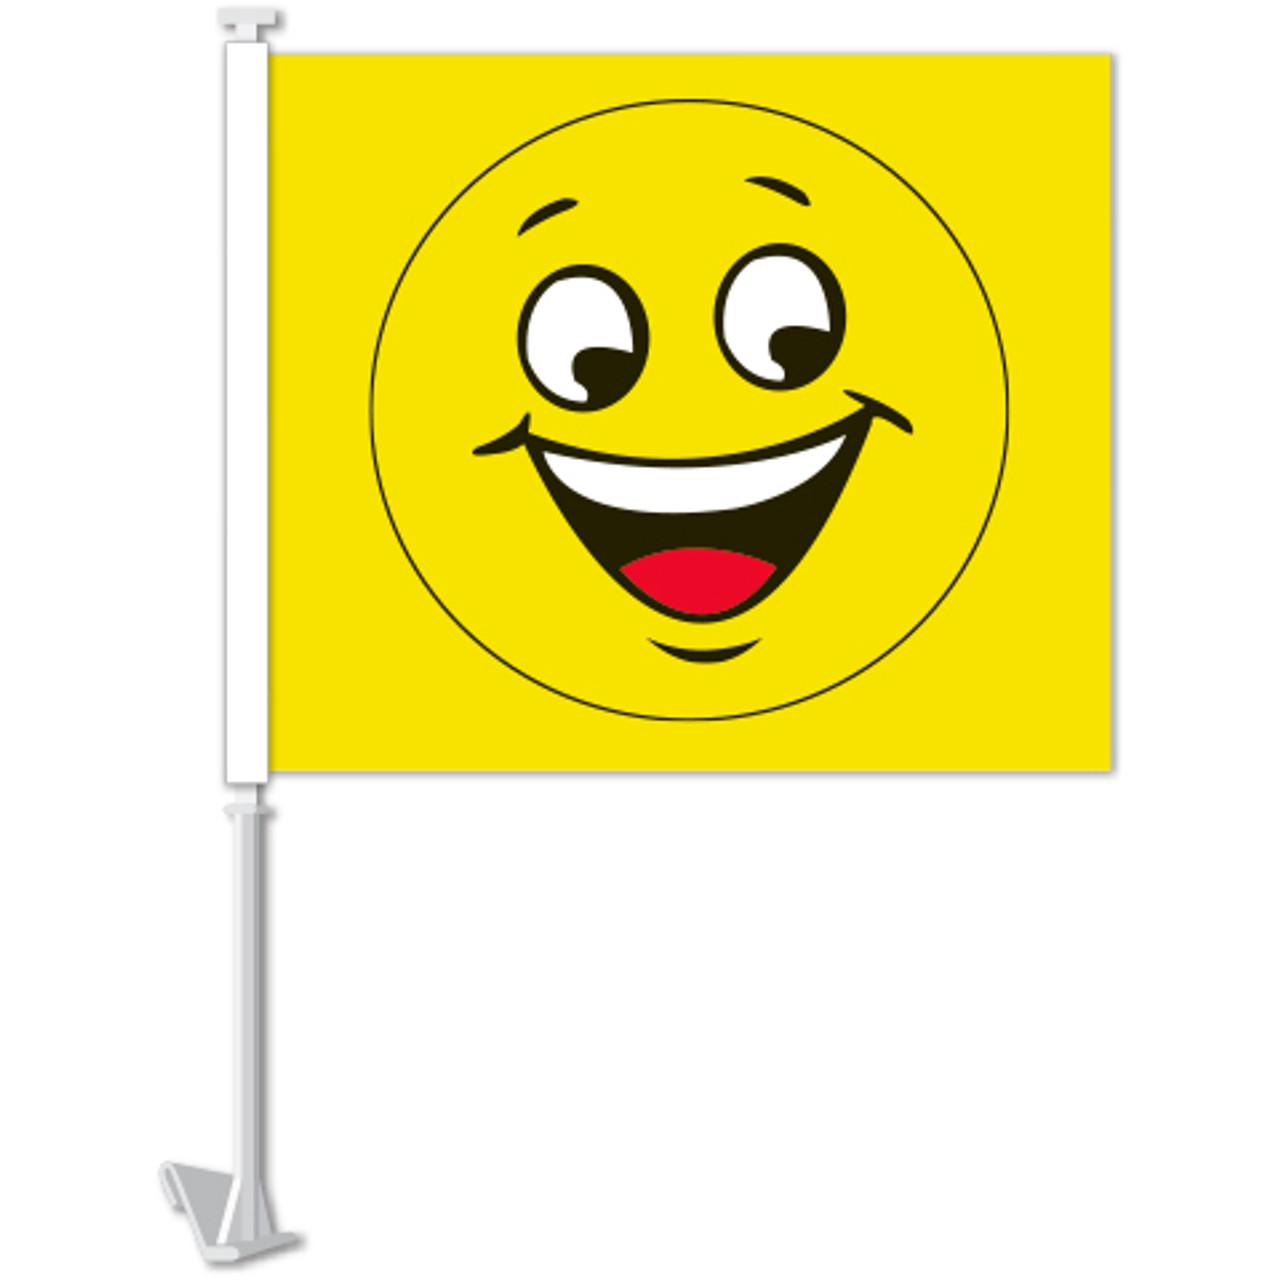 "Clip-On Window Flags 11"" x13"" (#4780)"